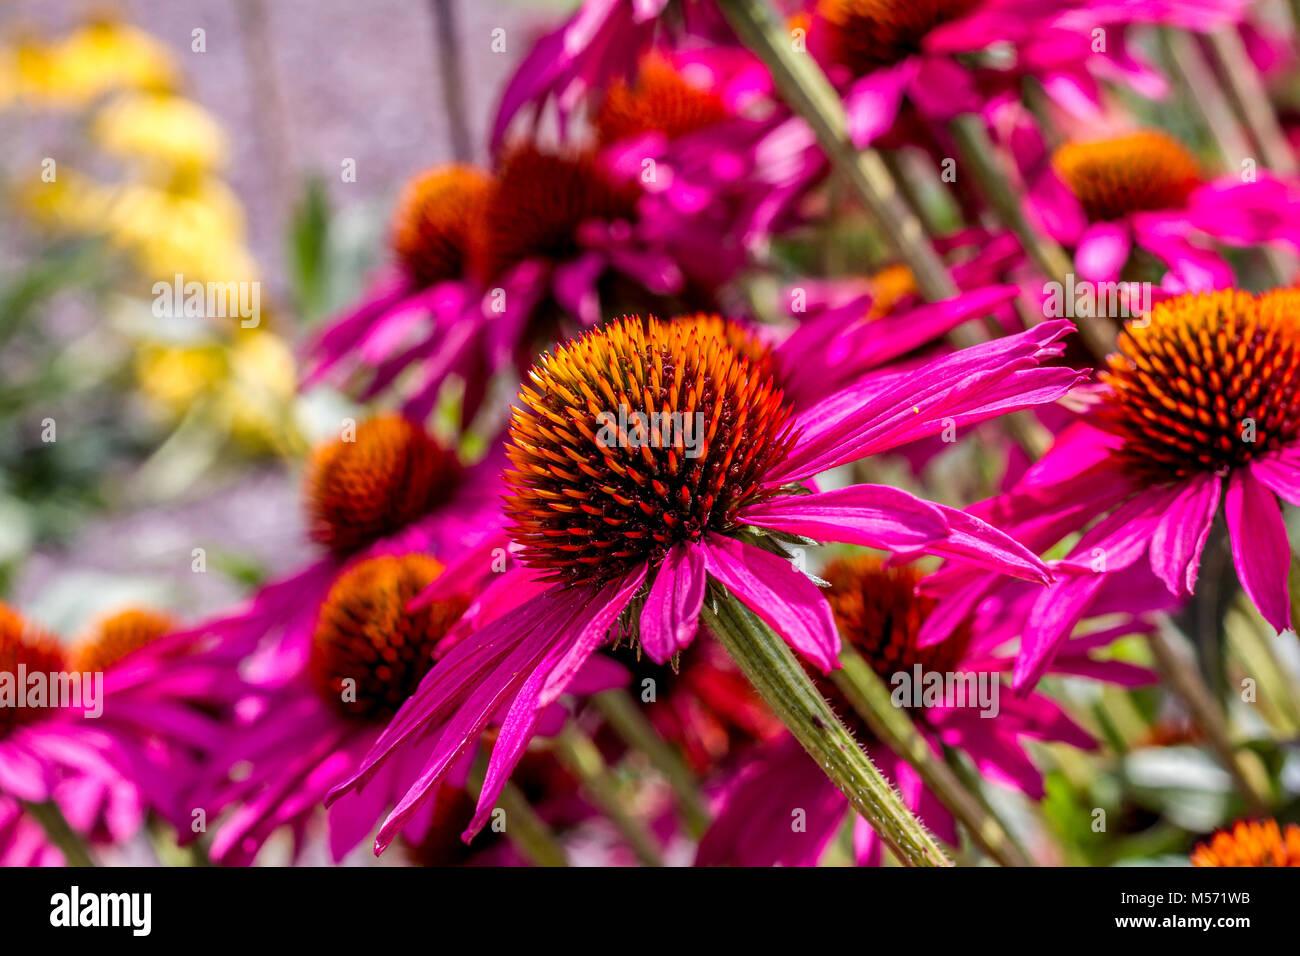 Echinacea 'Pink Shimmer' (Coneflower) - Stock Image